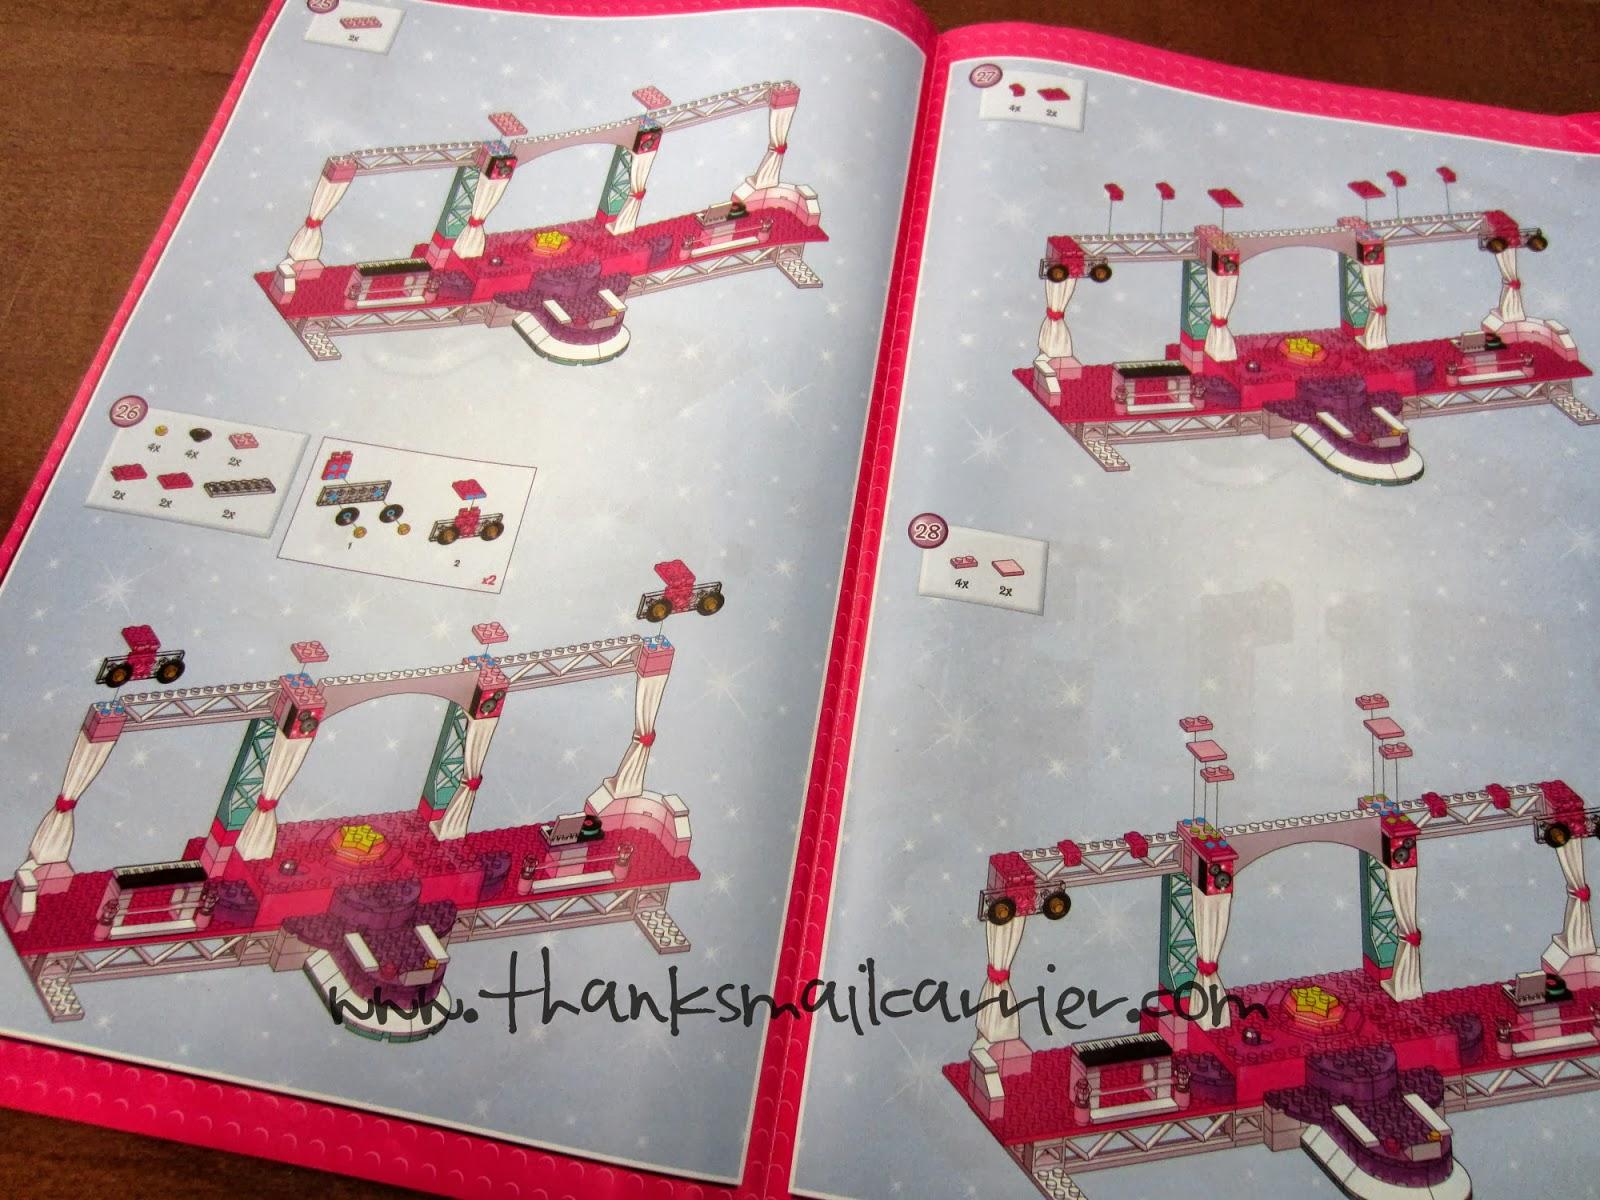 Mega Bloks Barbie Stage instructions